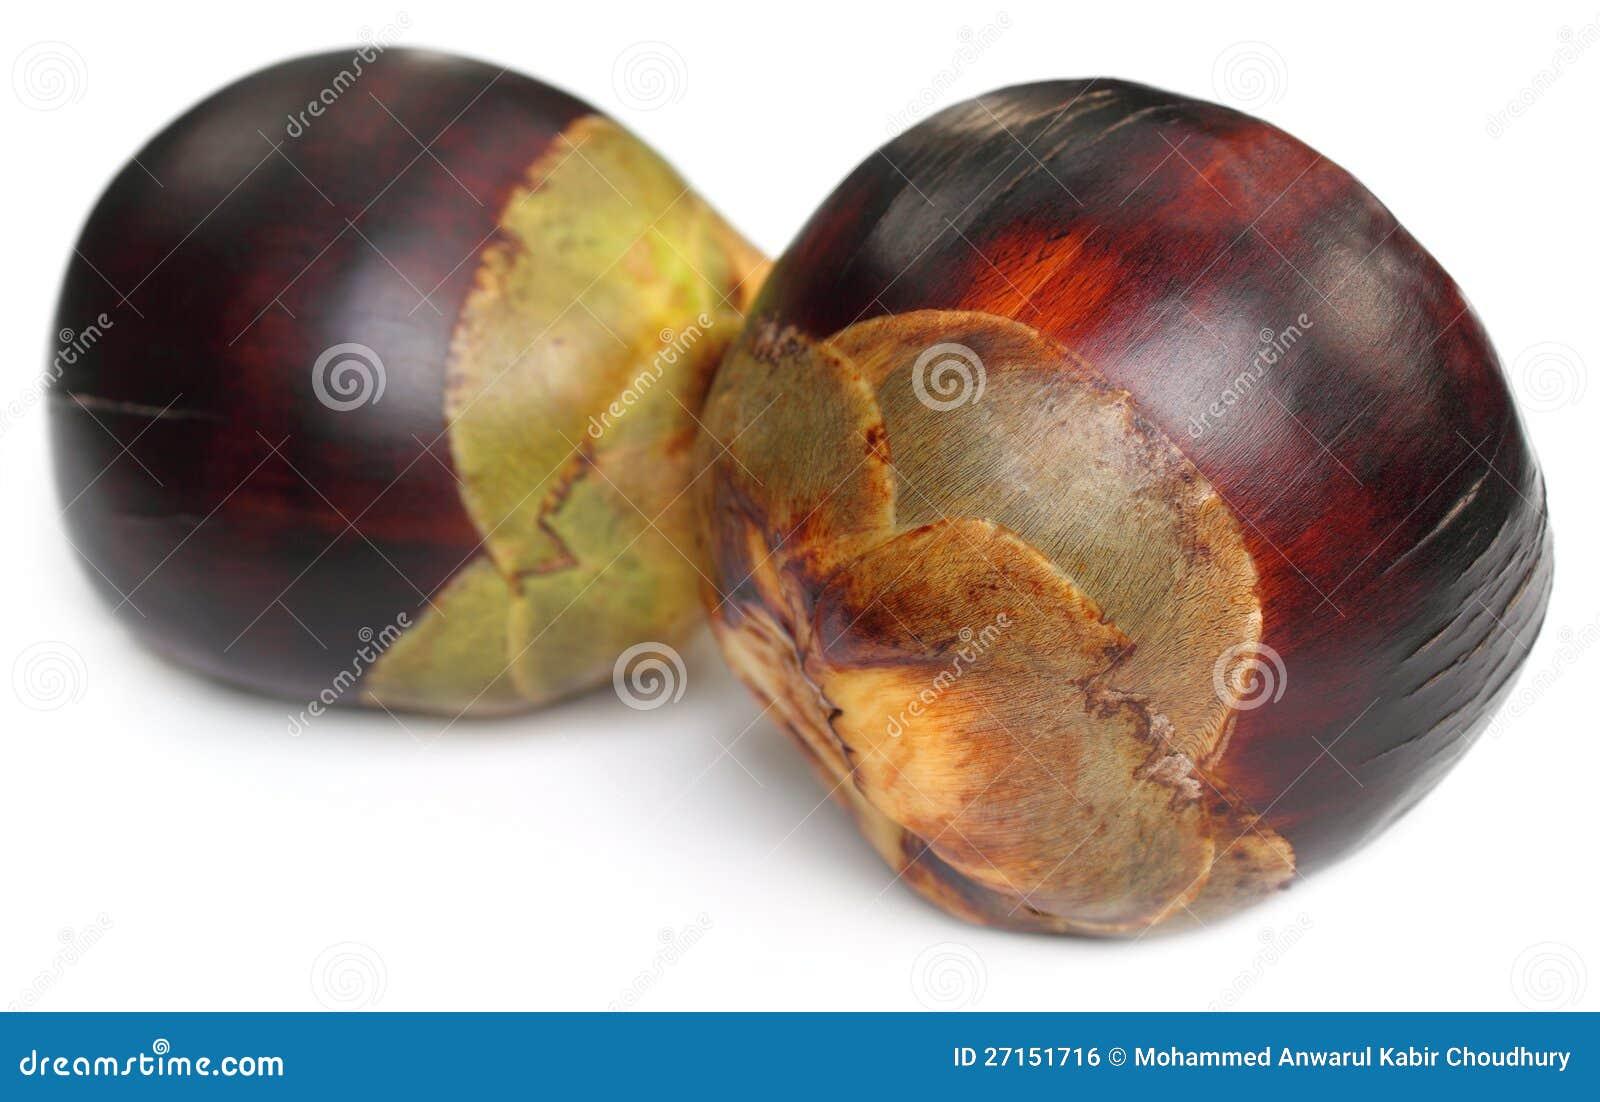 indisch fruit